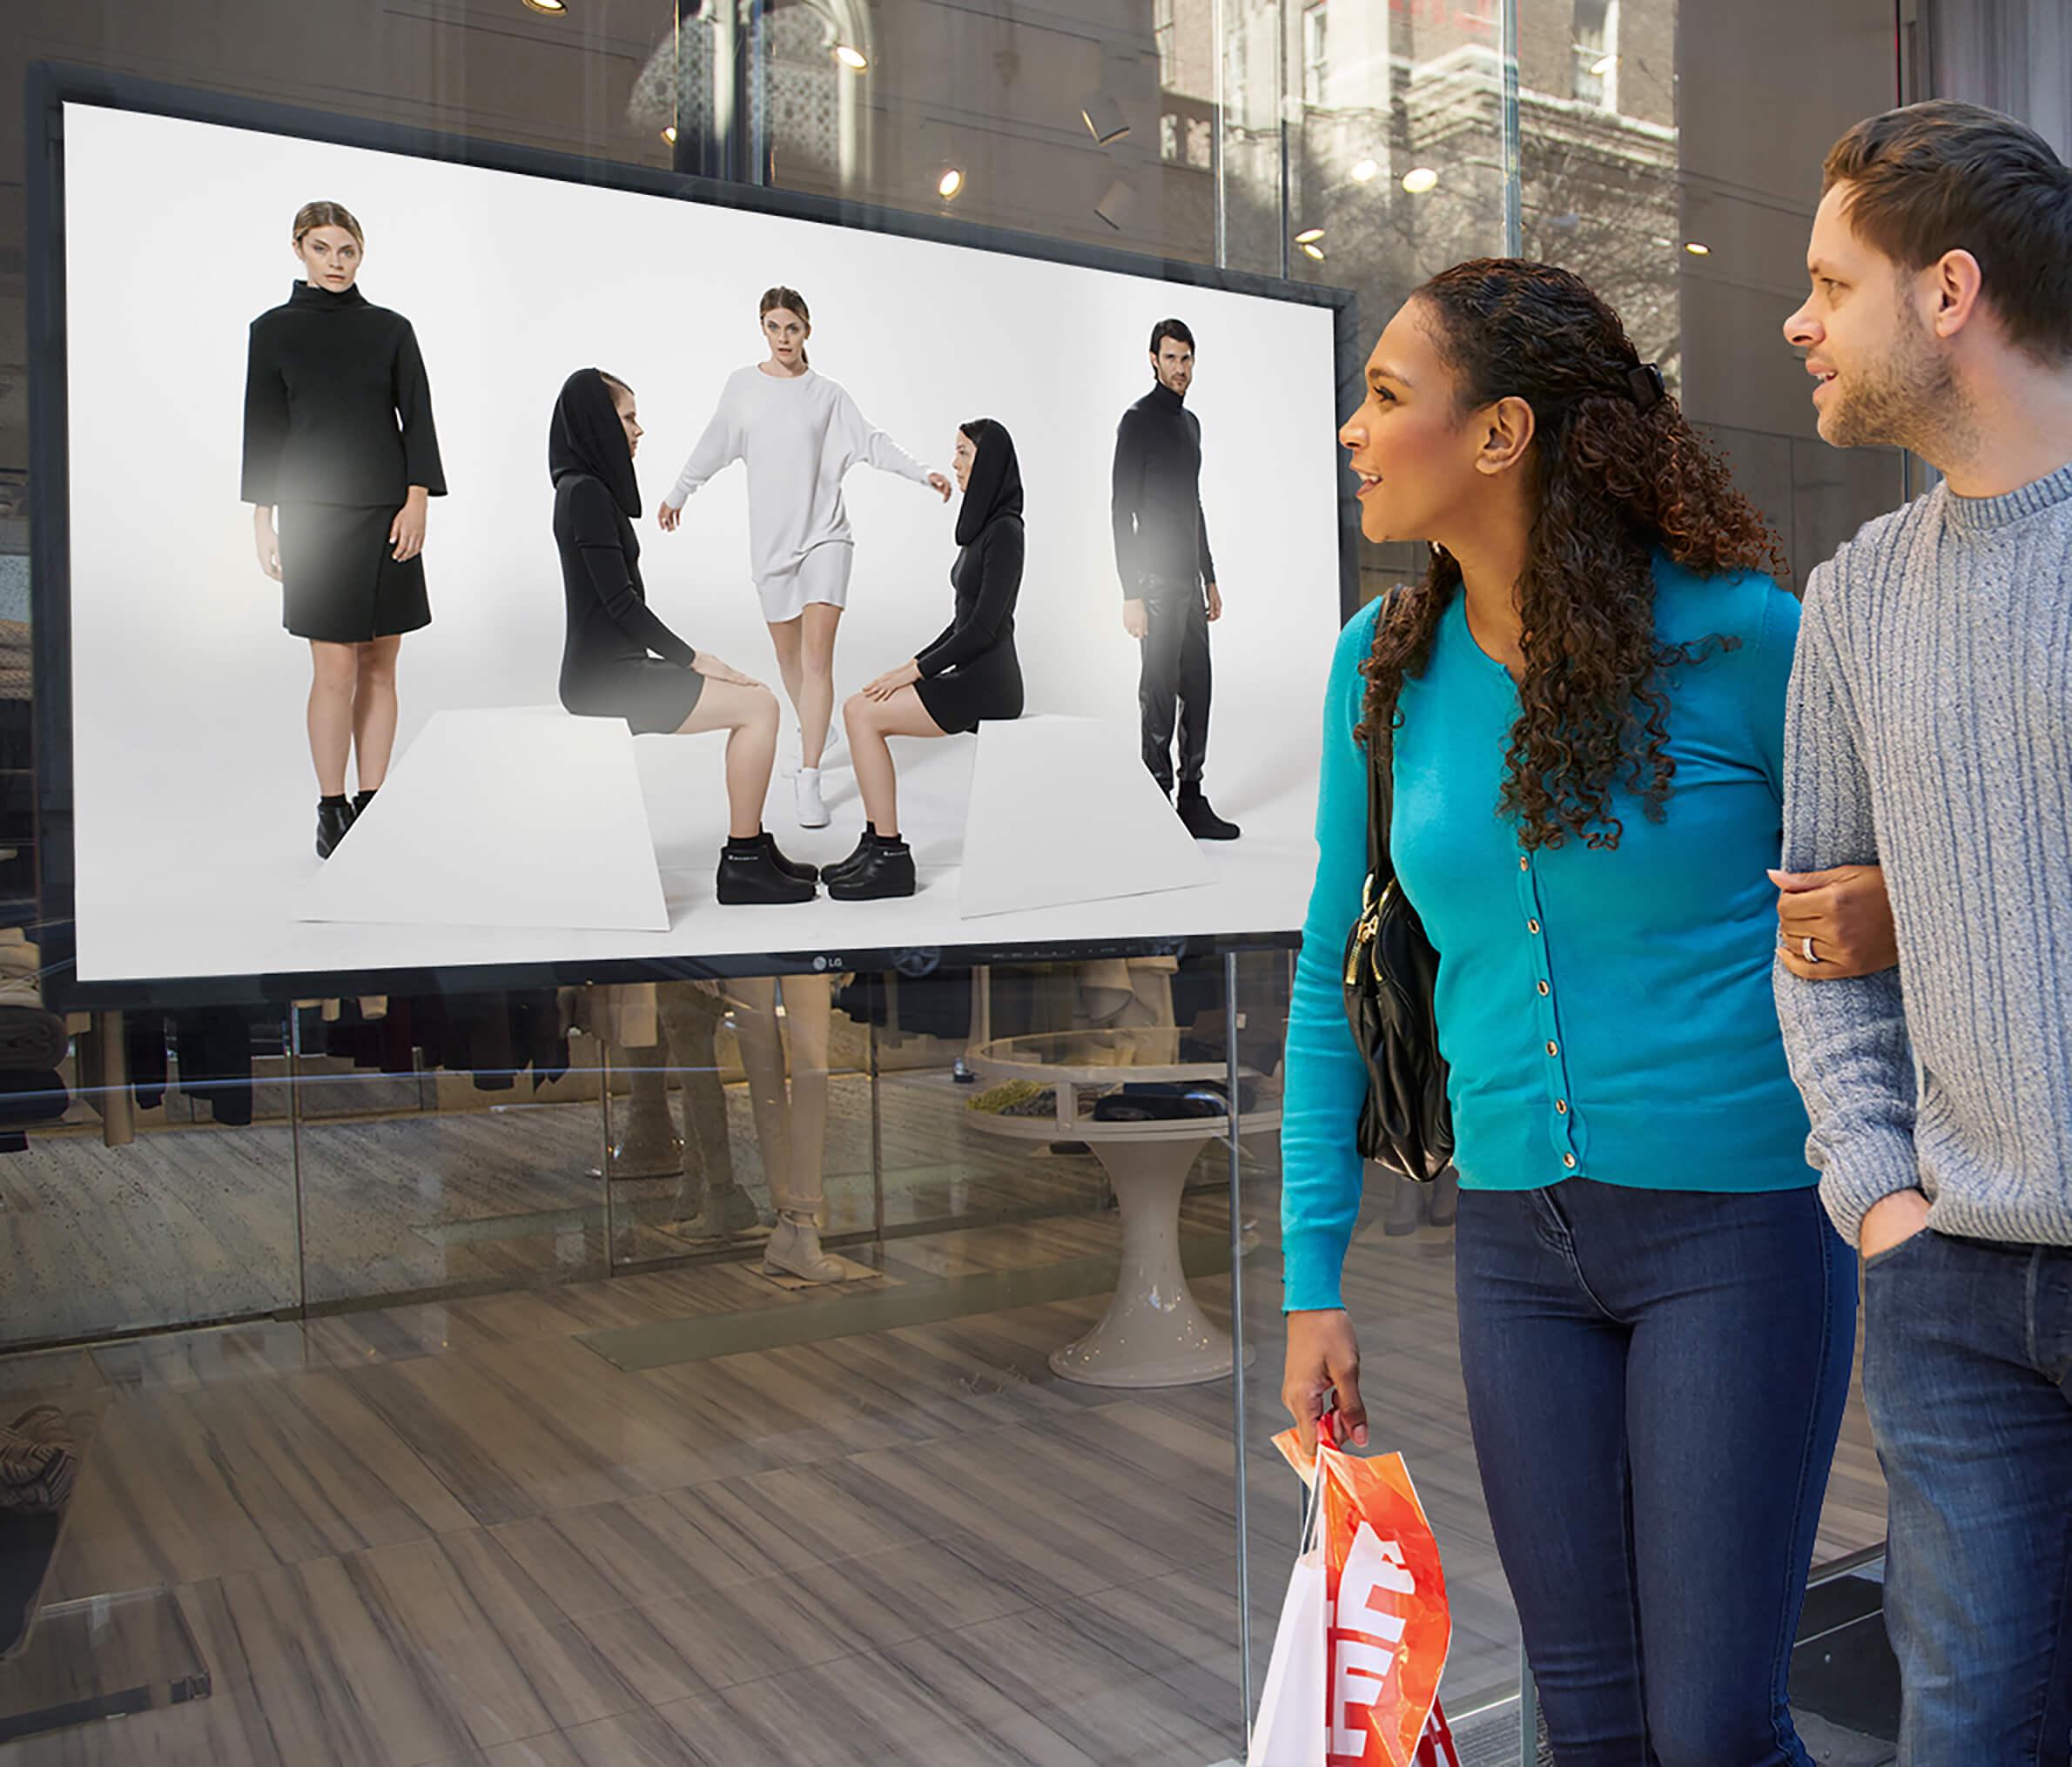 digital signage retail, digital signage window, window shopping